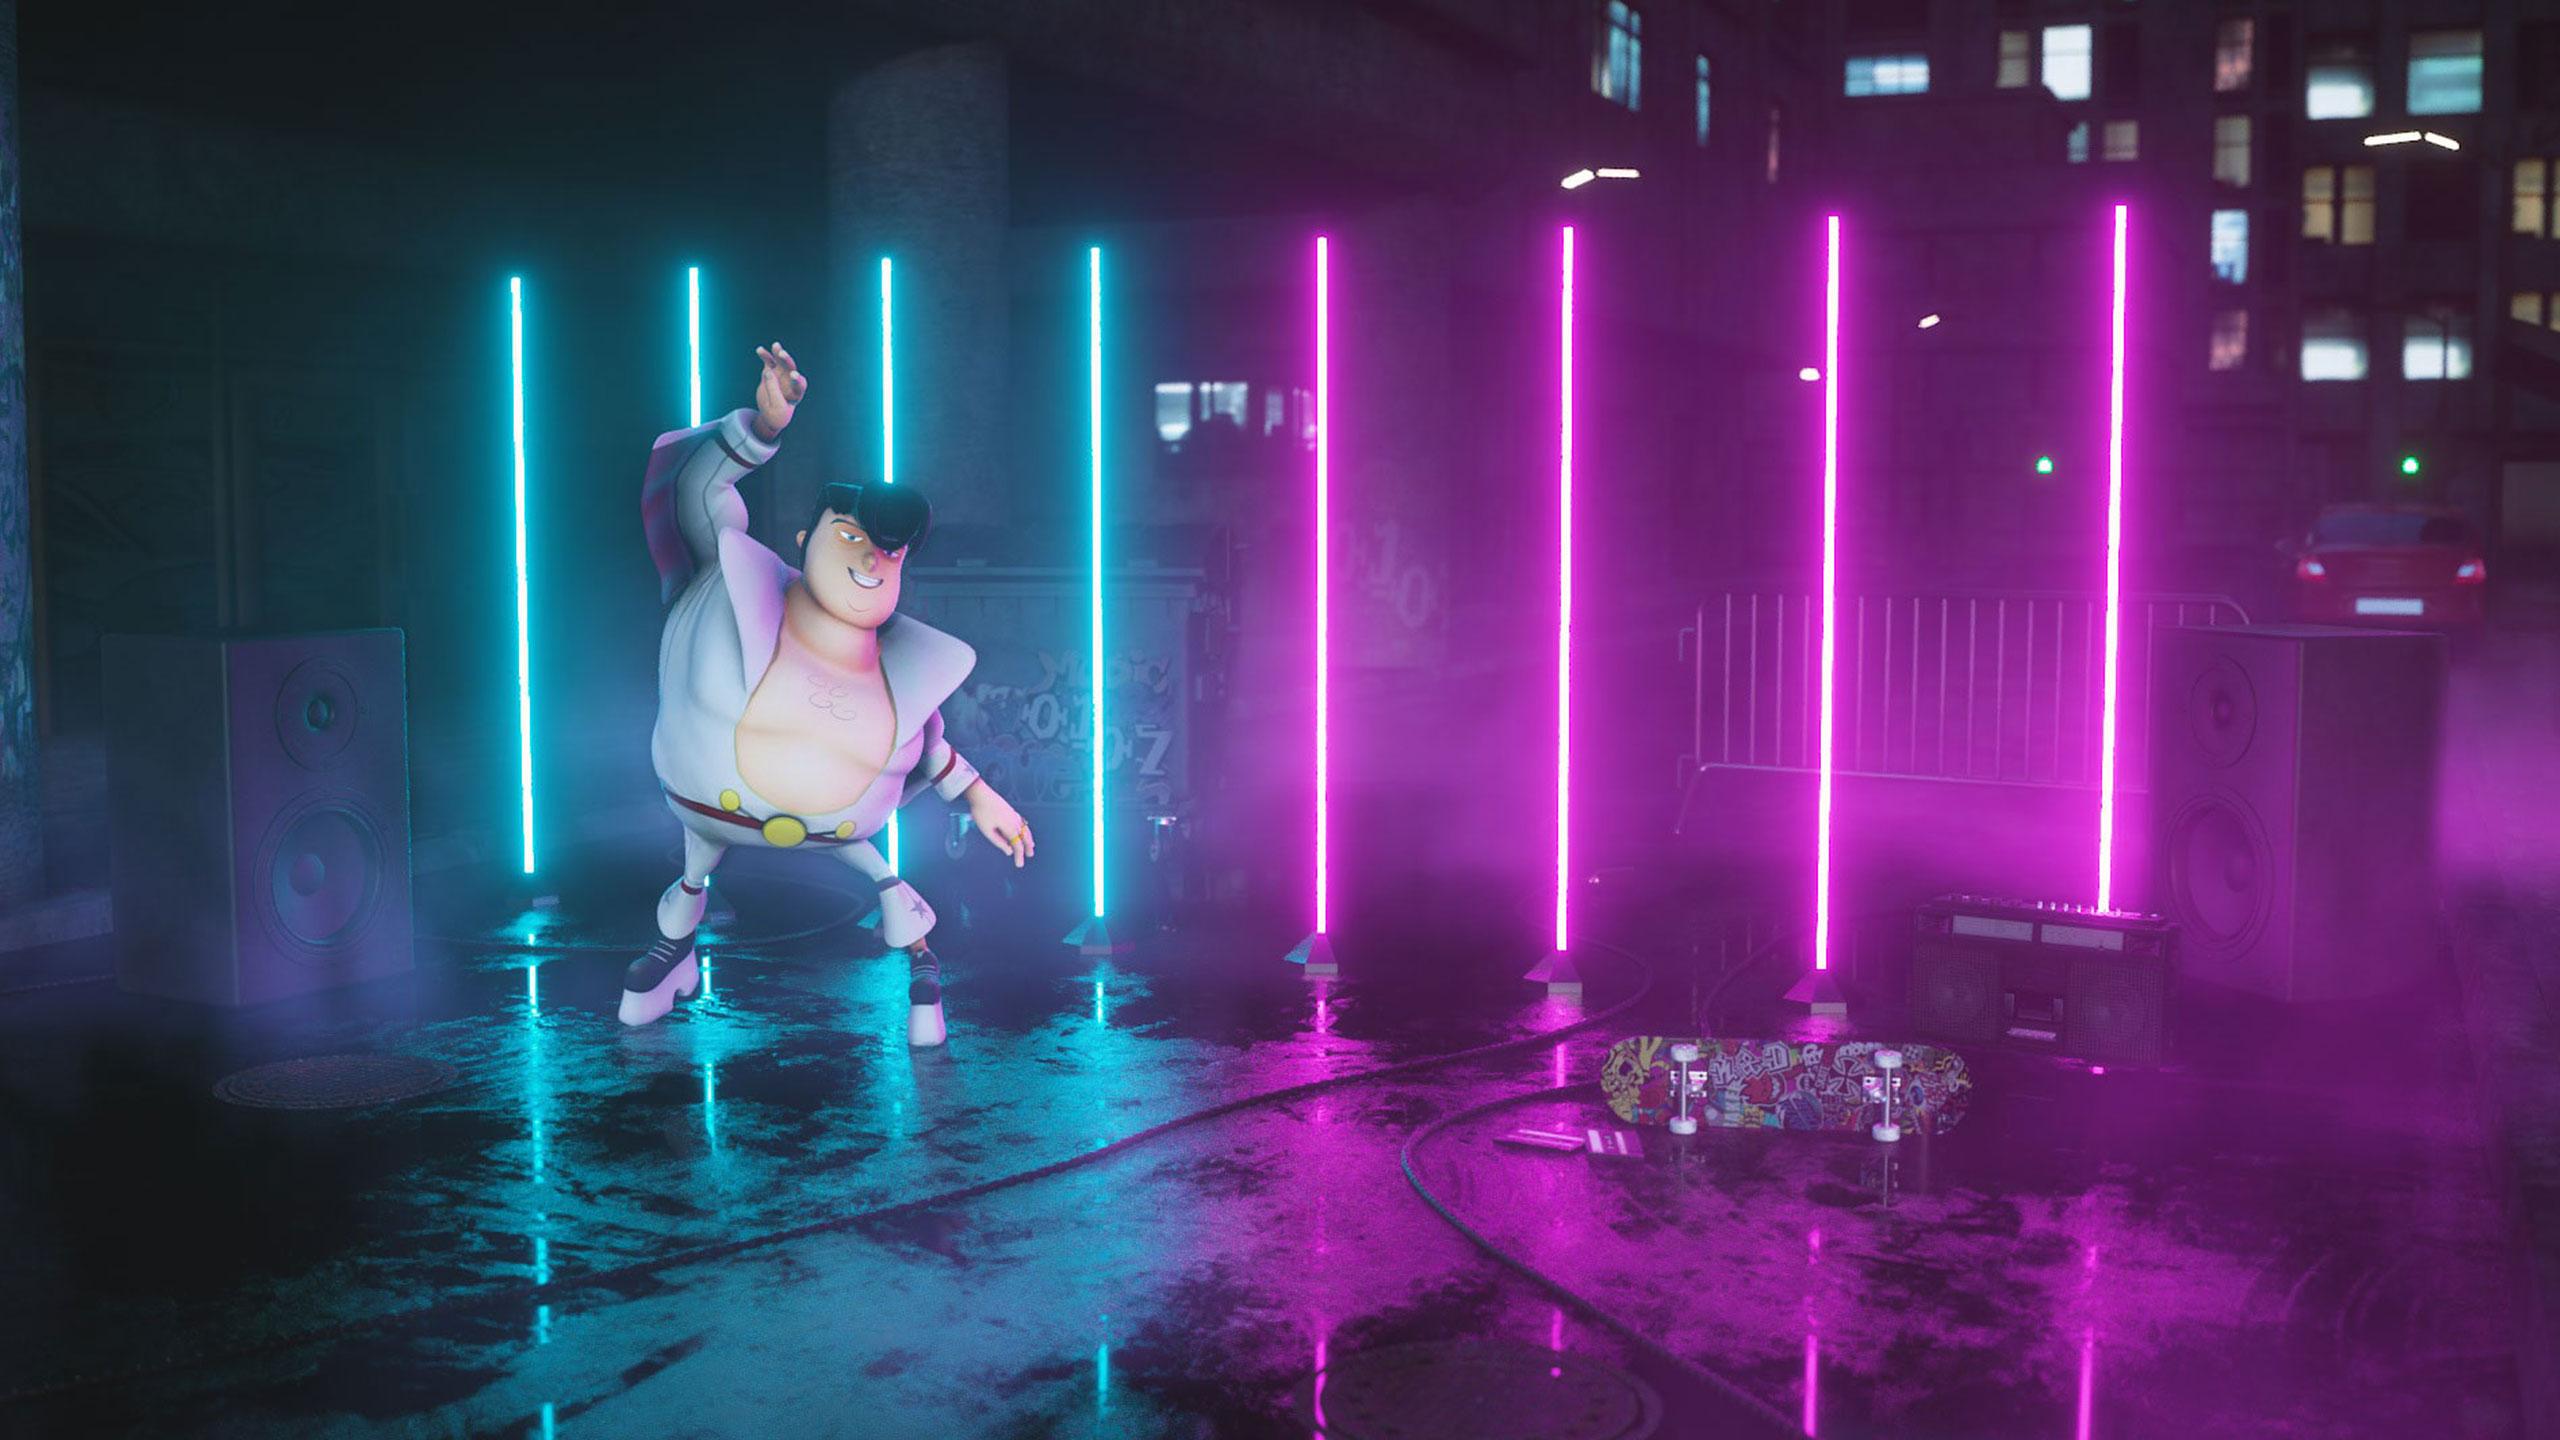 Elvis dancing thriller to techno